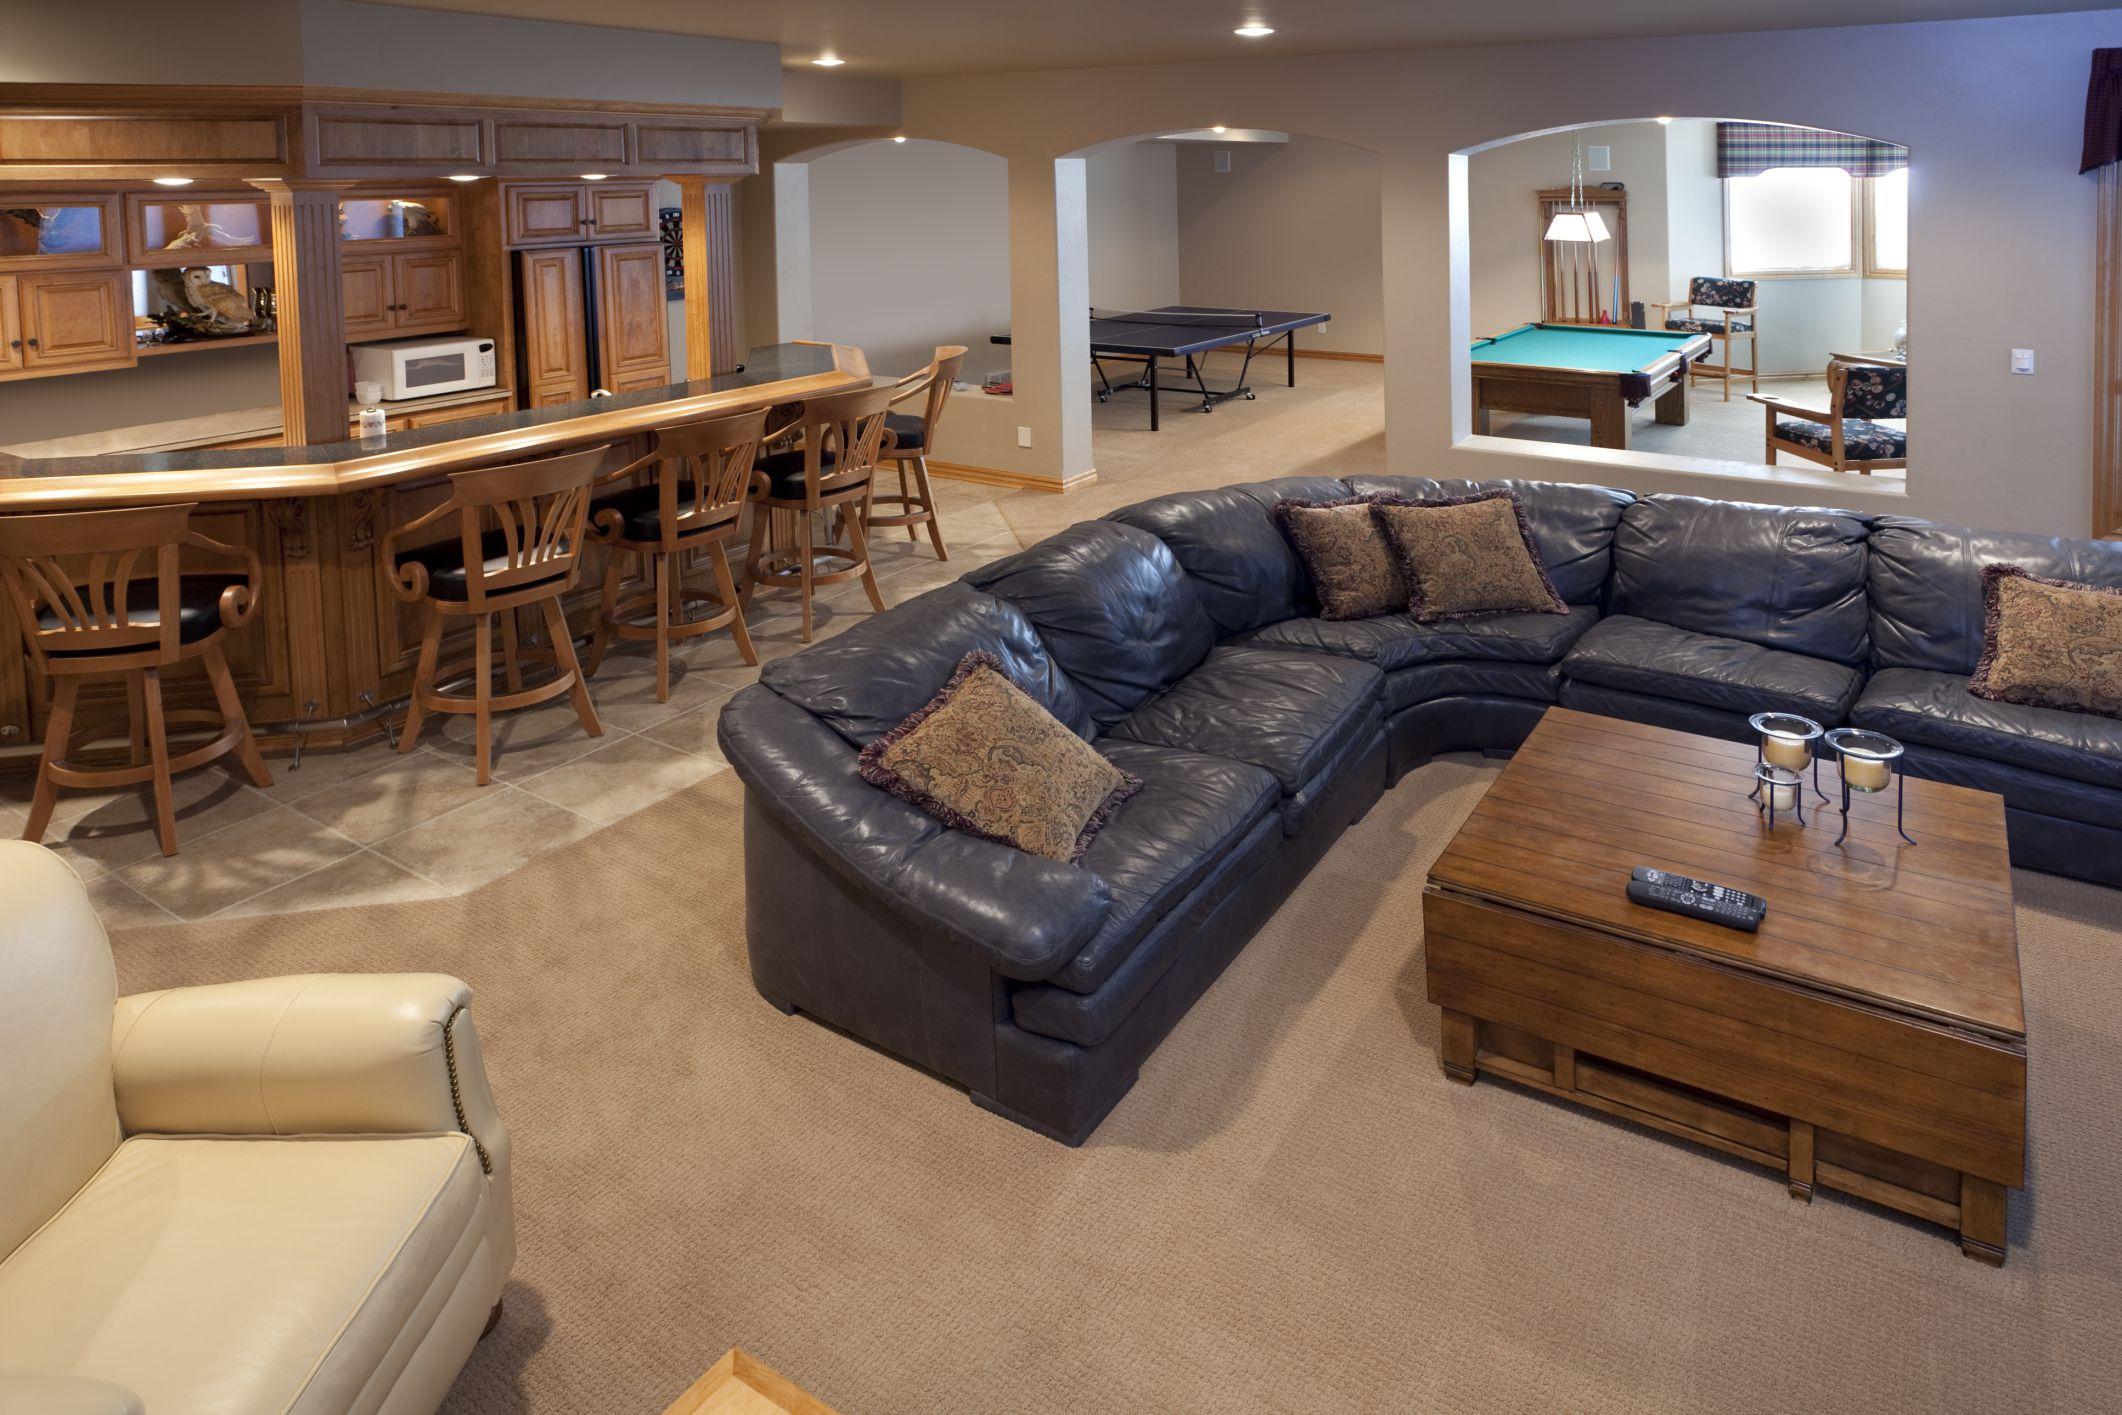 Home Bar Room Pics Incredible Home Design